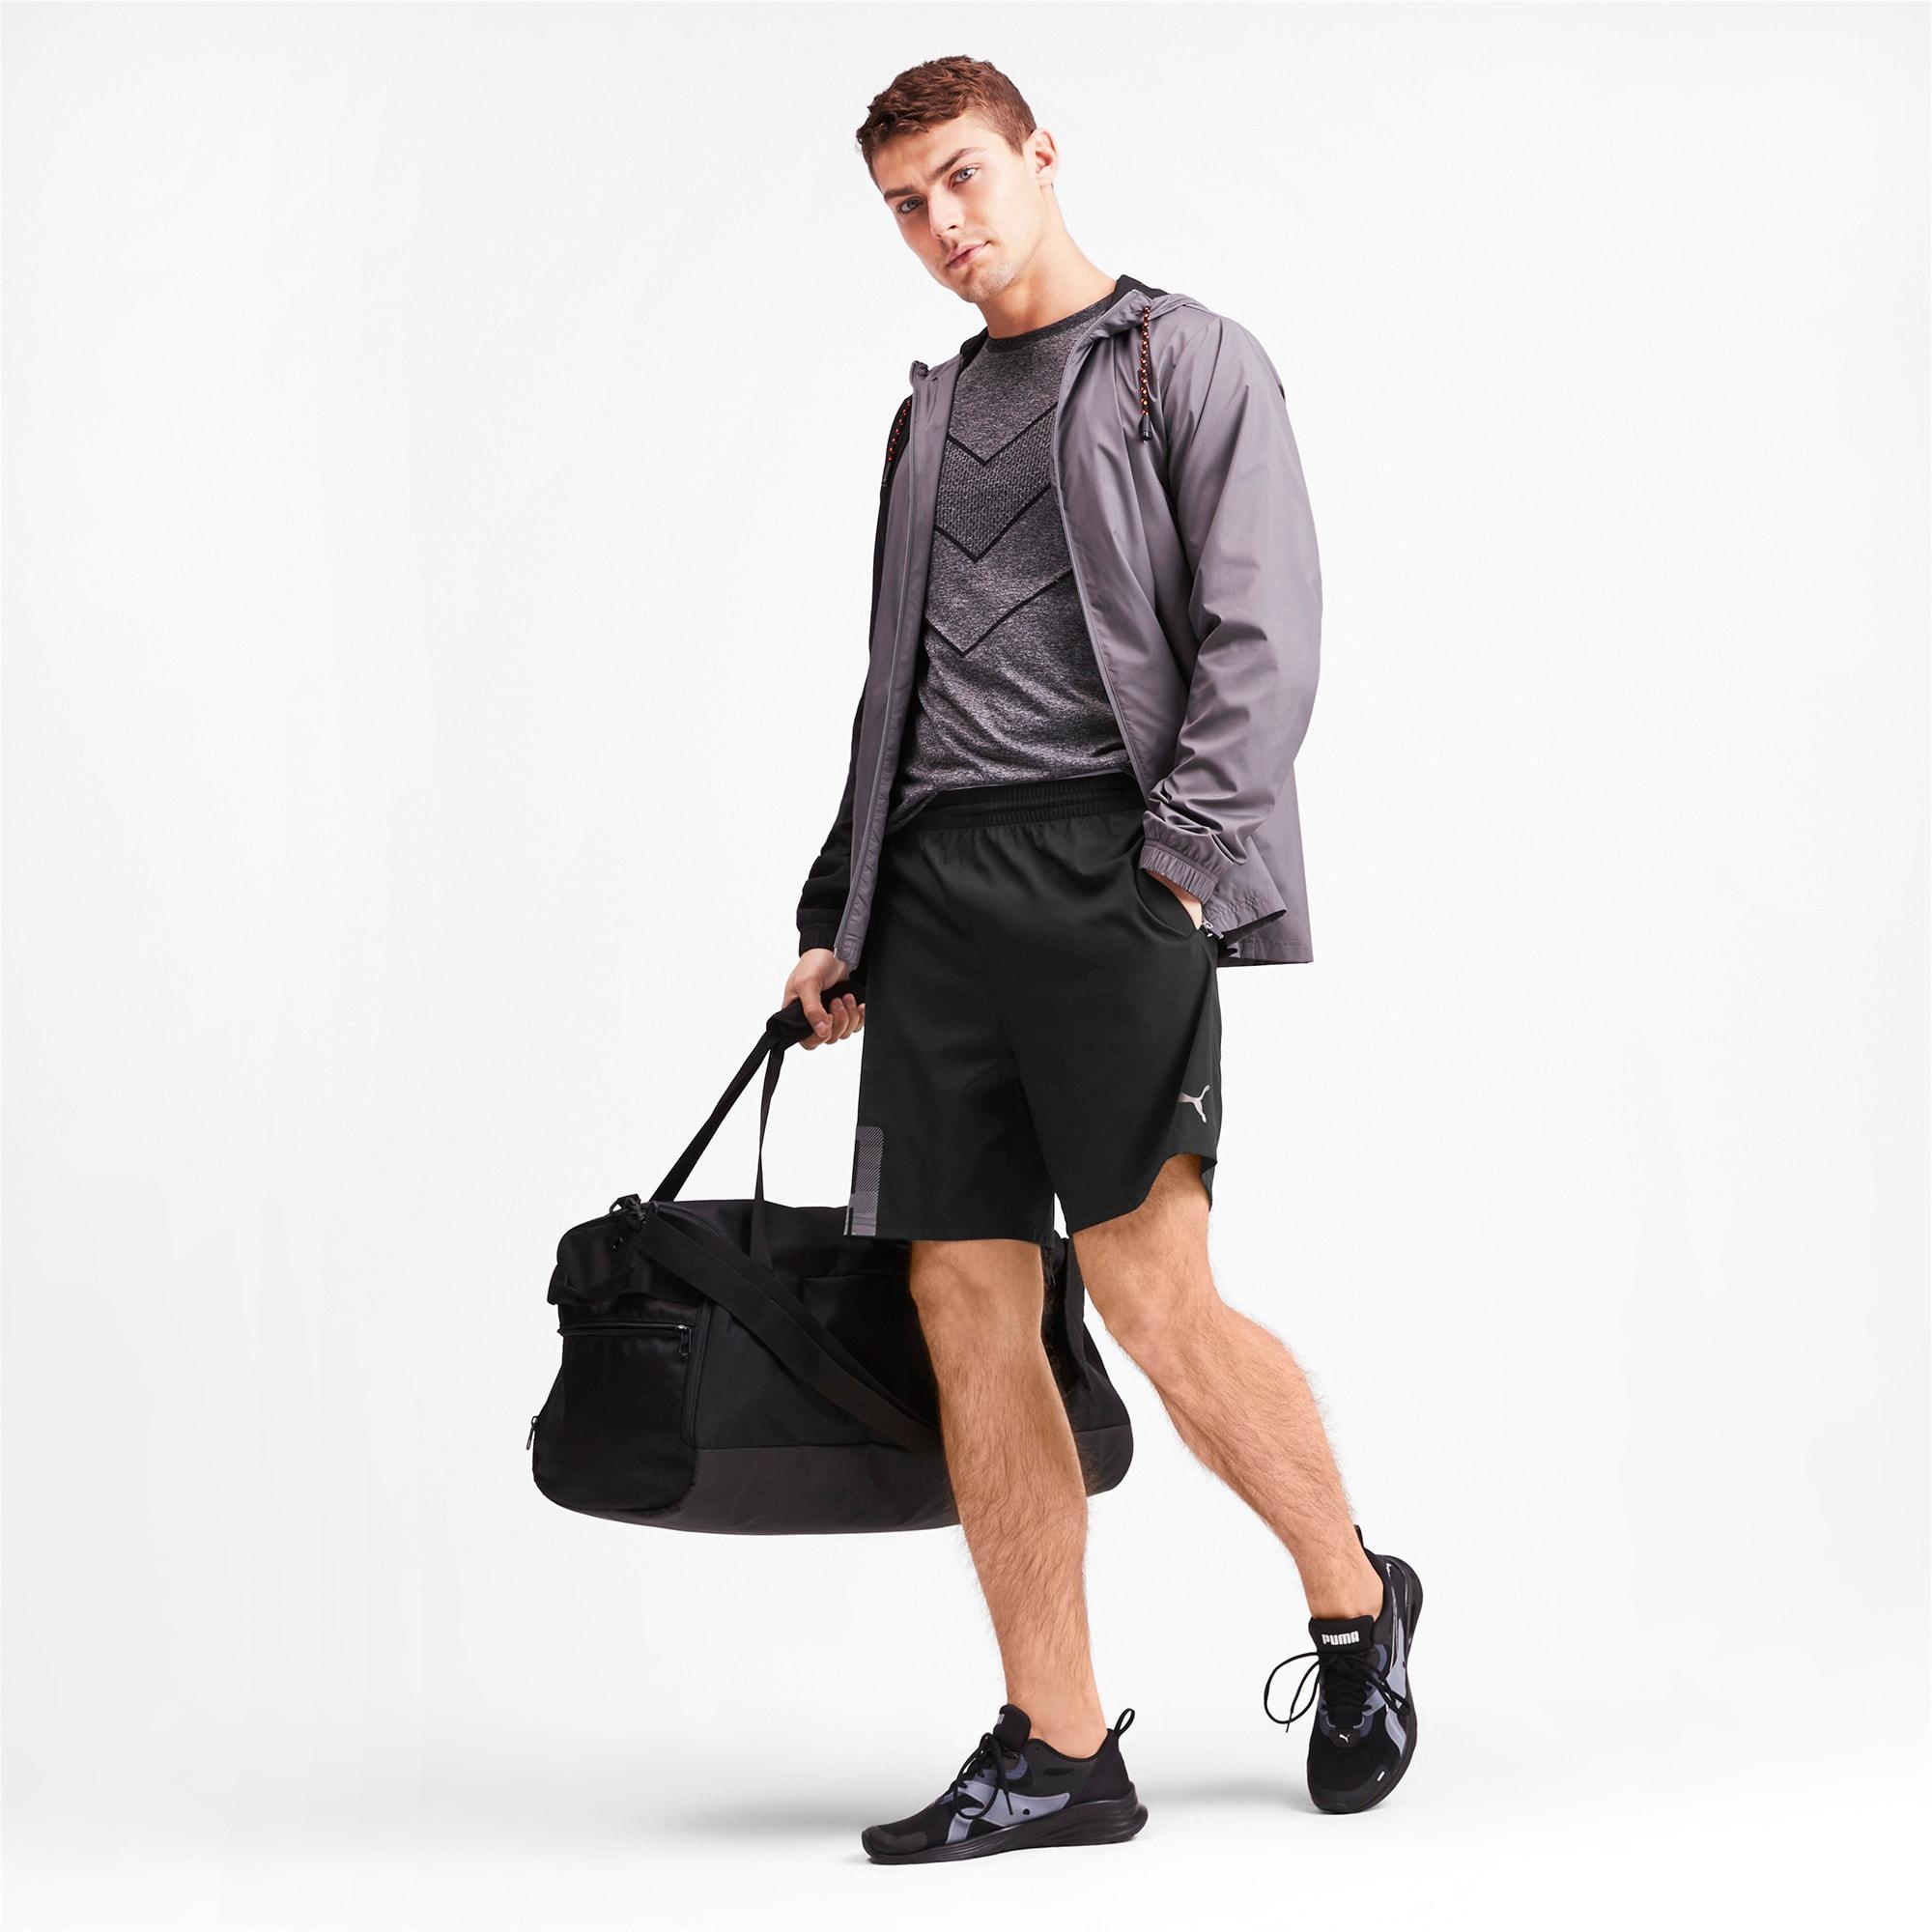 Thumbnail 3 of Collective Woven Men's Training Shorts, Puma Black, medium-IND